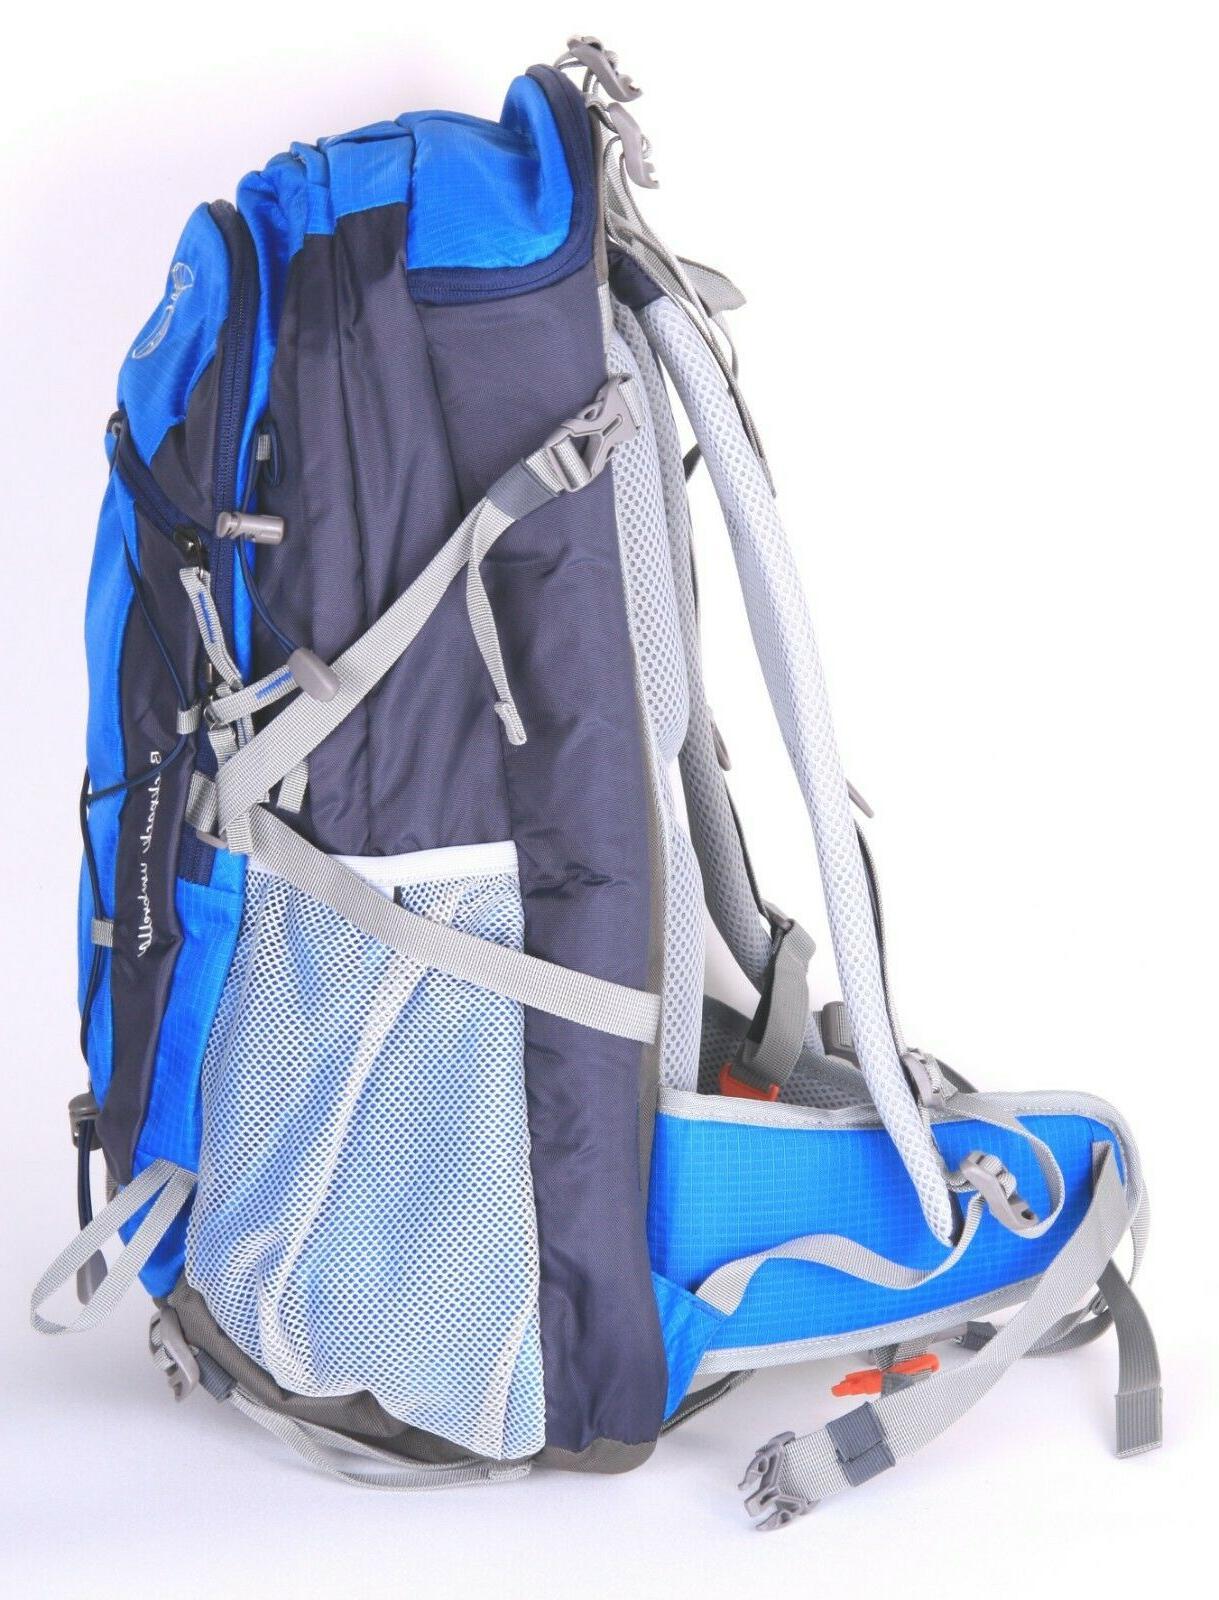 FunShell 40L Hiking Backpack Umbrella, Camping UV Protection Blue